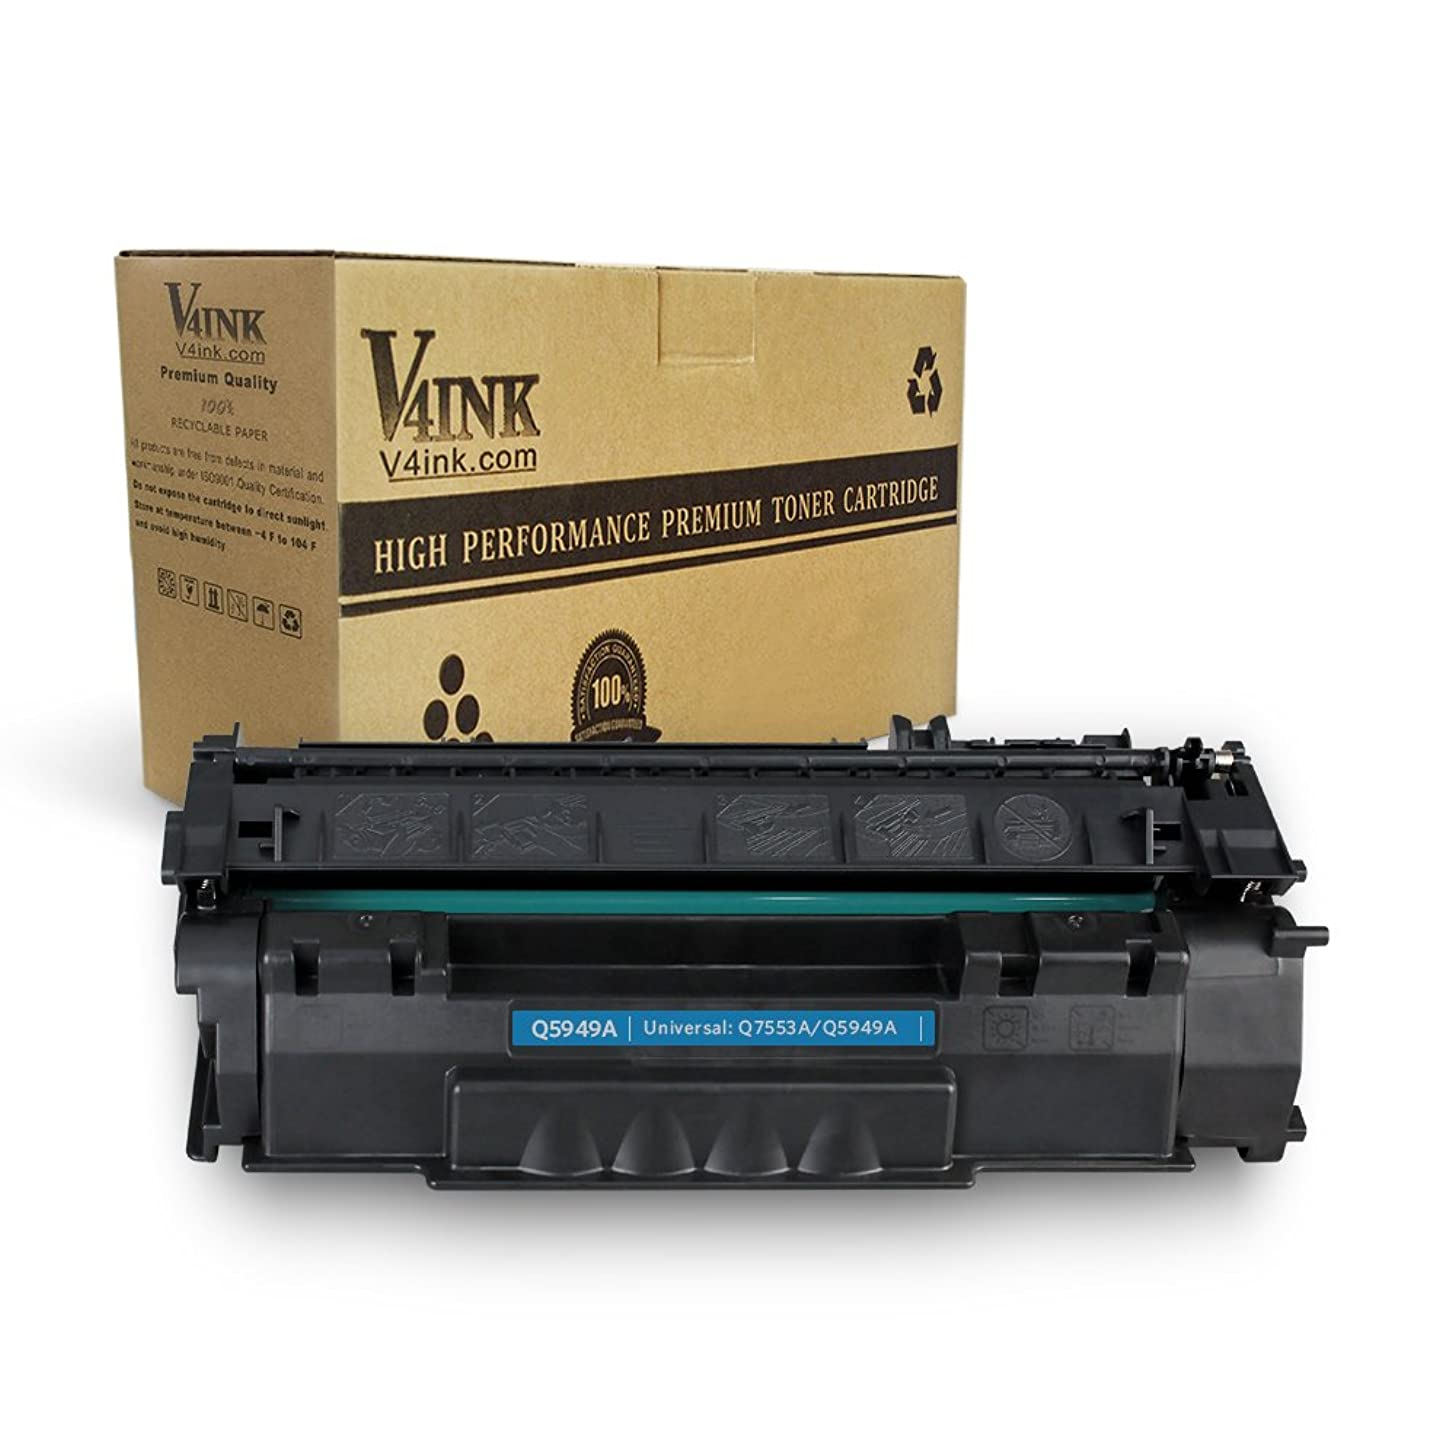 V4INK Compatible Toner Cartridge Replacement for HP Q5949A 49A Q7553A 53A for use with HP Laserjet 1320 1320n P2015dn P2015 P2015n 3390 3392 1160 P2014 M2727nf MFP Printer (Black,1 Pack)